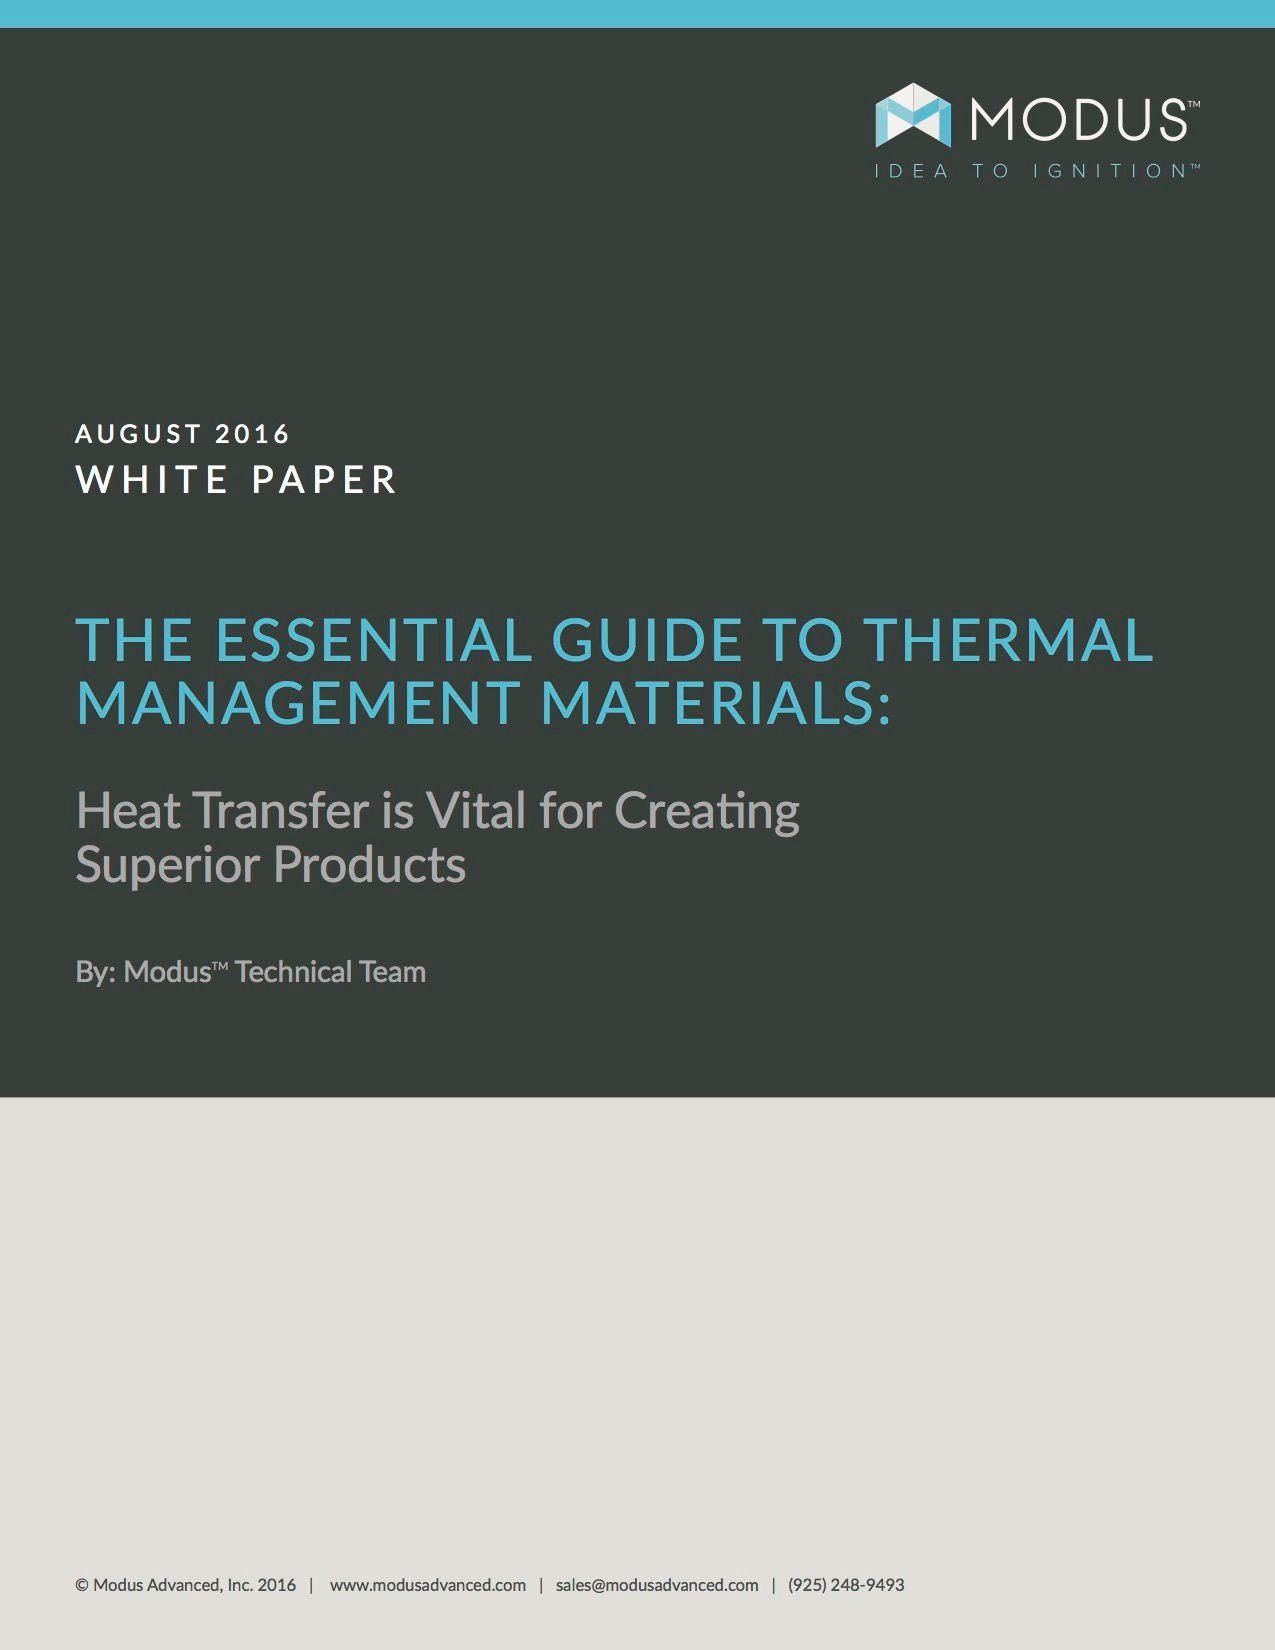 Thermal_Management_White_Paper.jpg